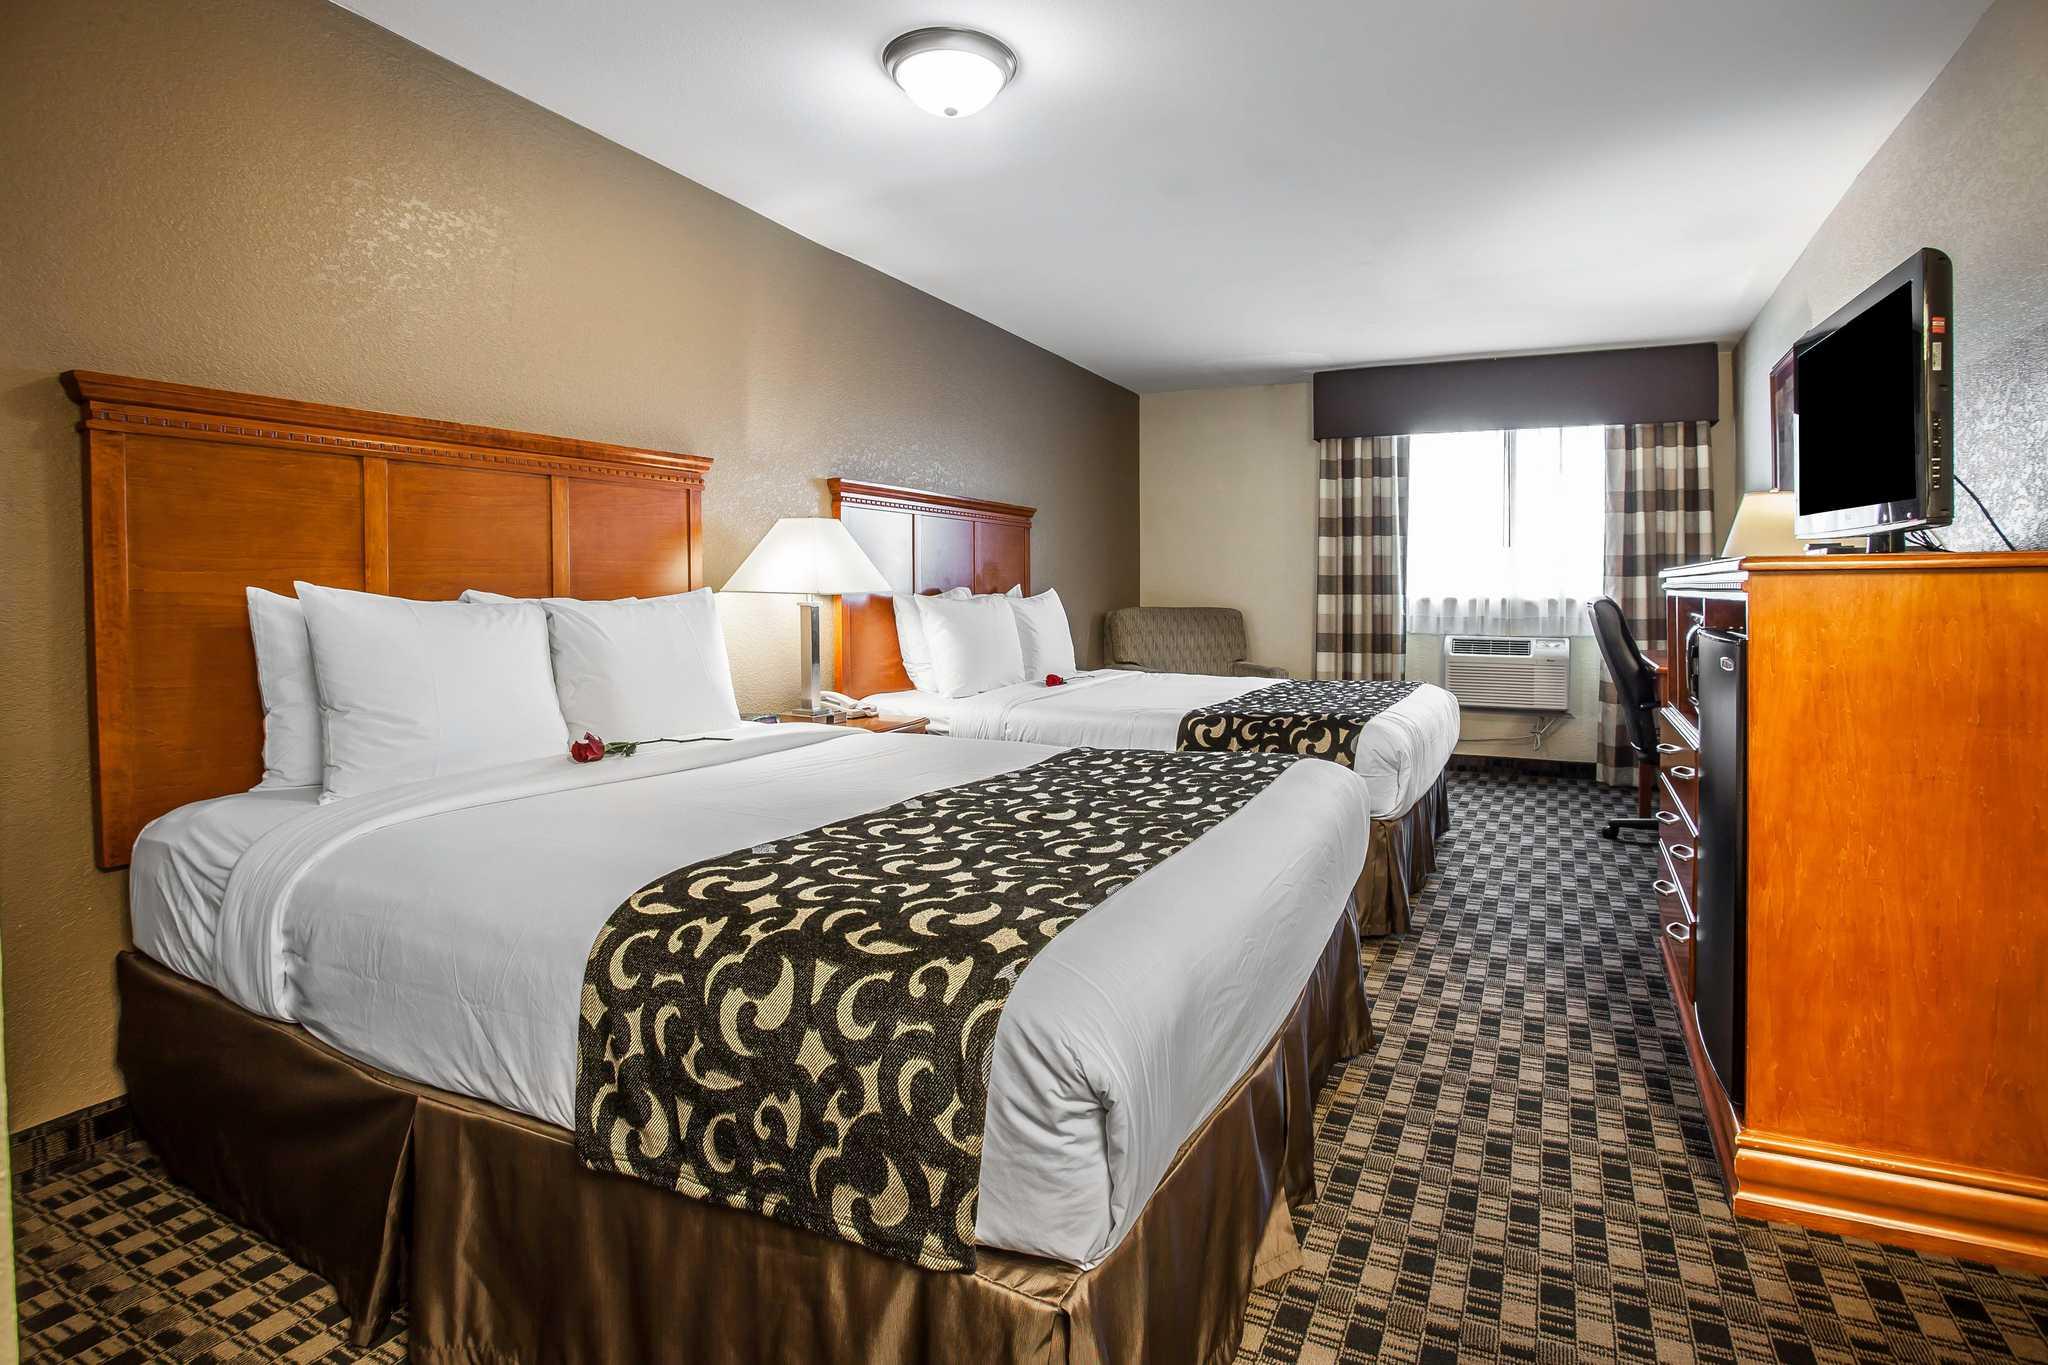 Rooms For Rent Near Renton Wa